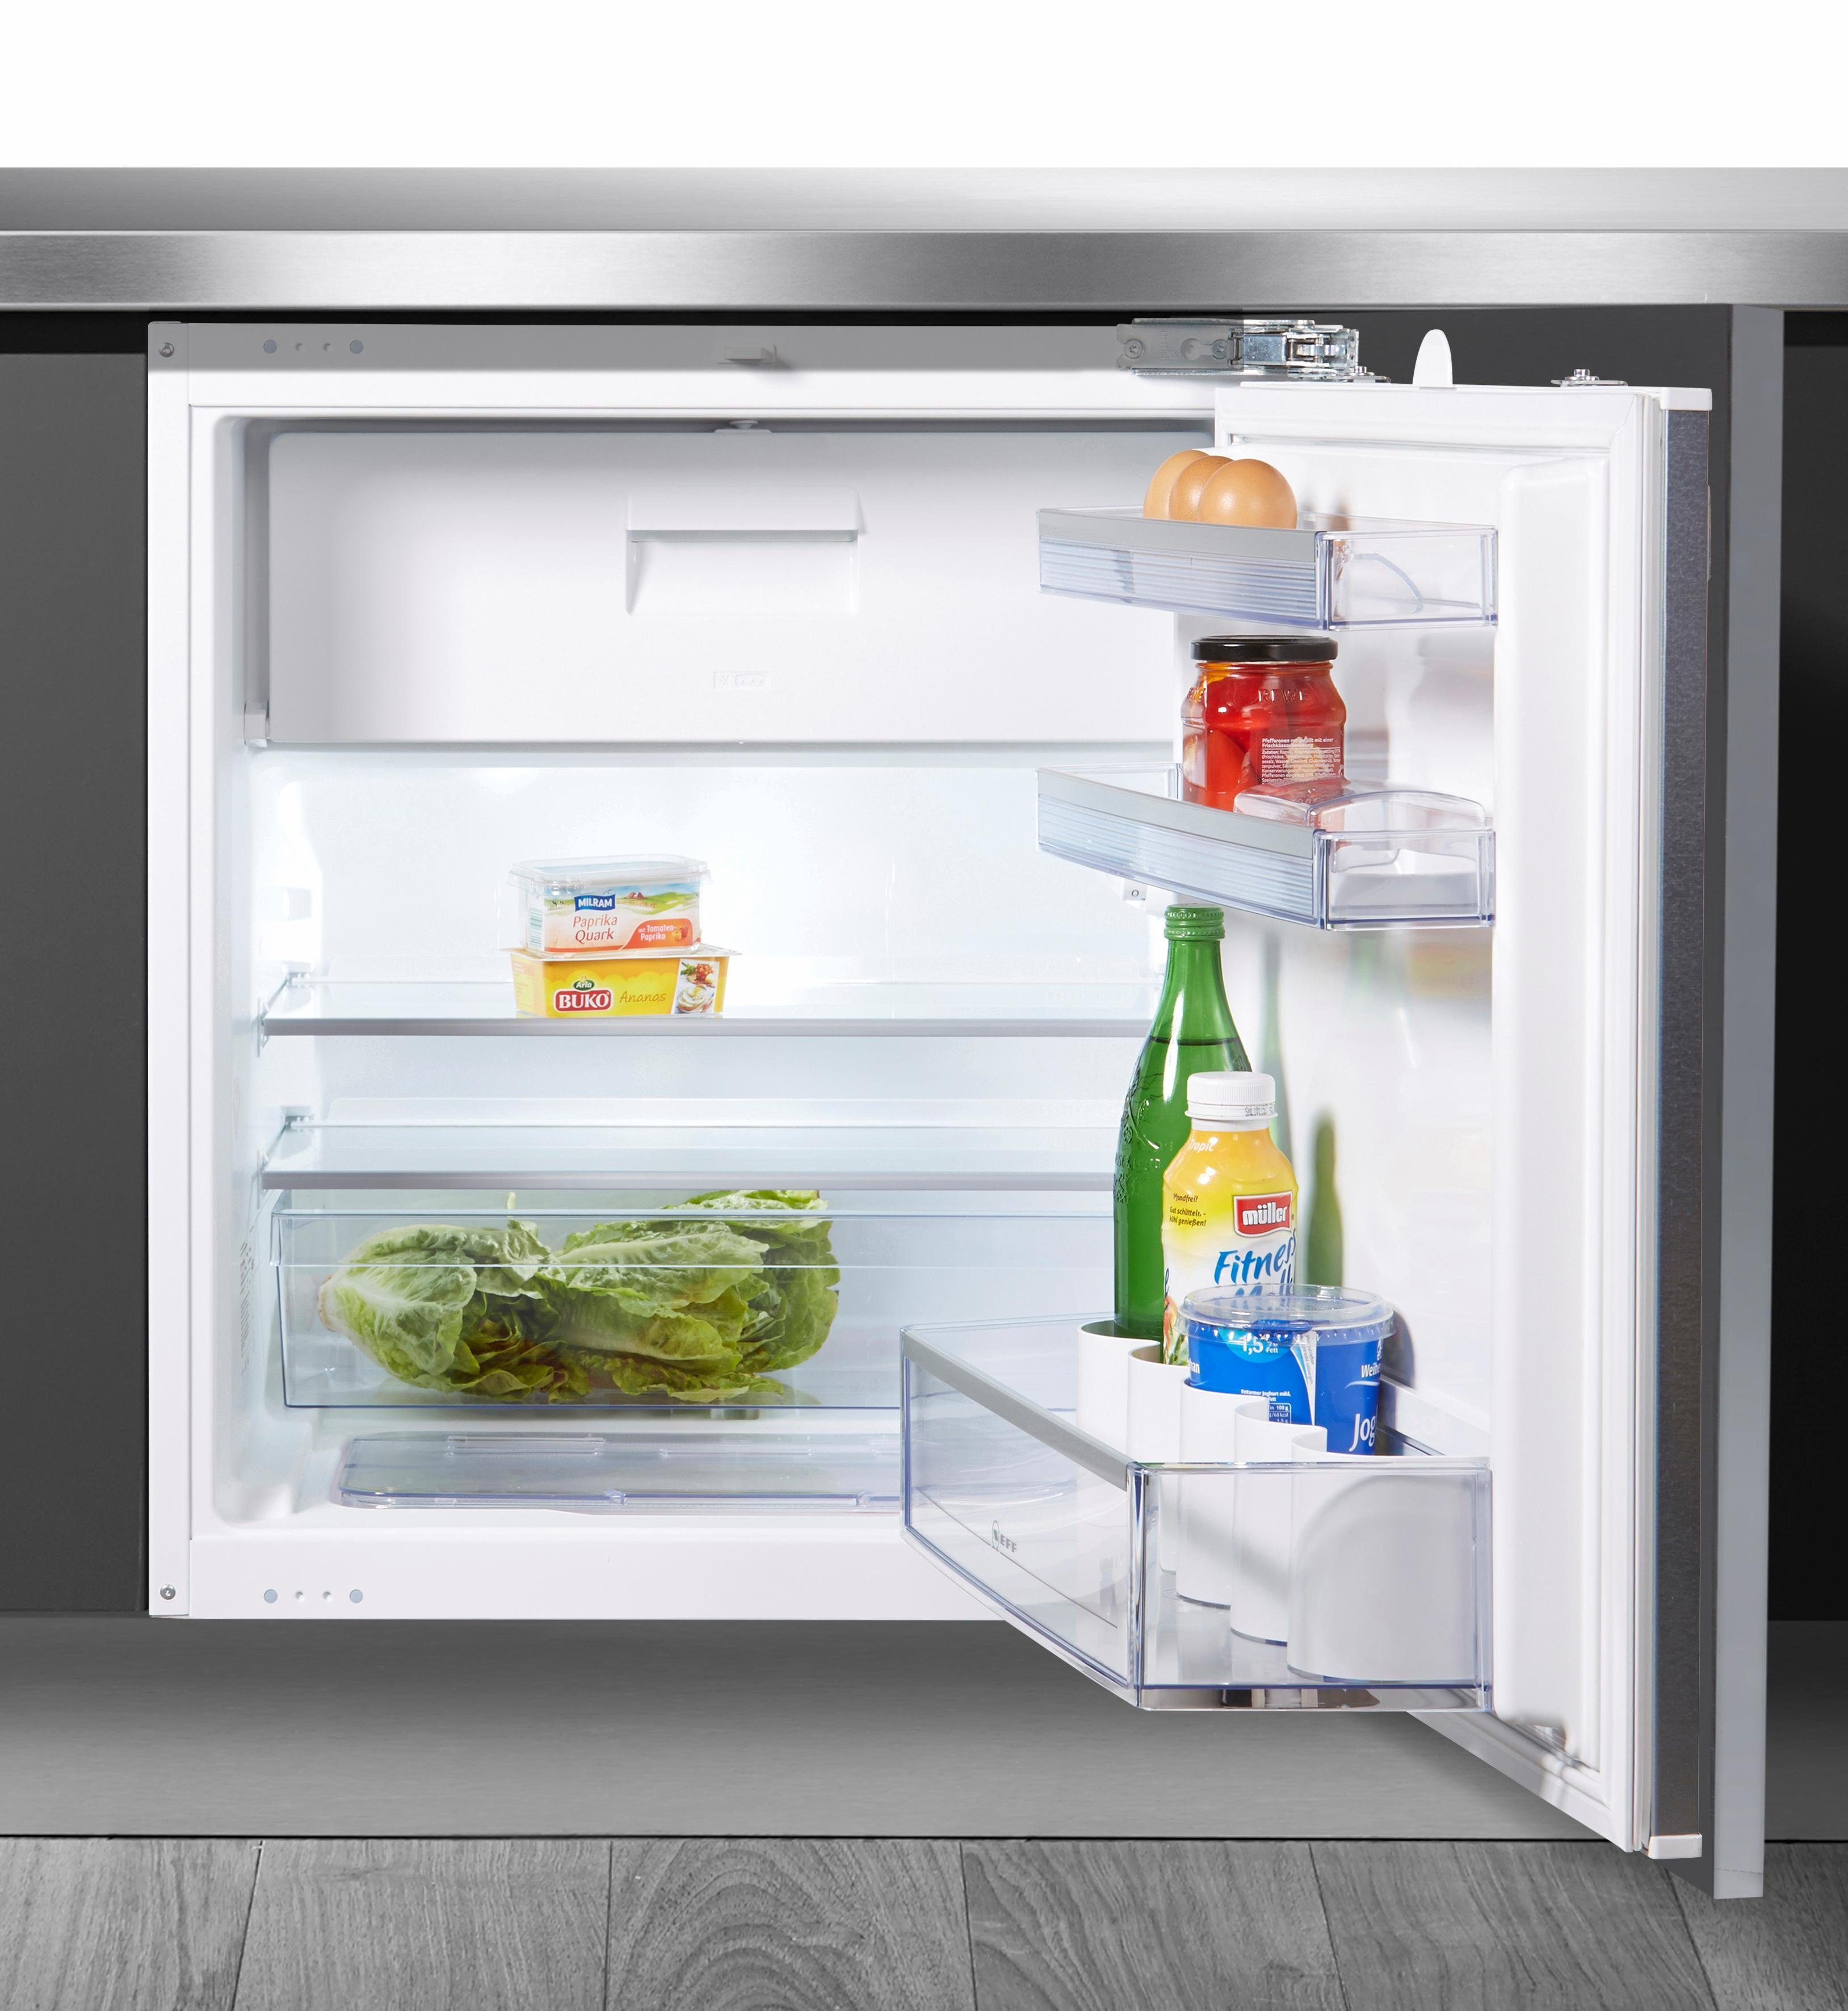 NEFF Einbaukühlschrank KU226A2 / K4336X8, 82,0 cm hoch, 59,8 cm breit, integrierbar